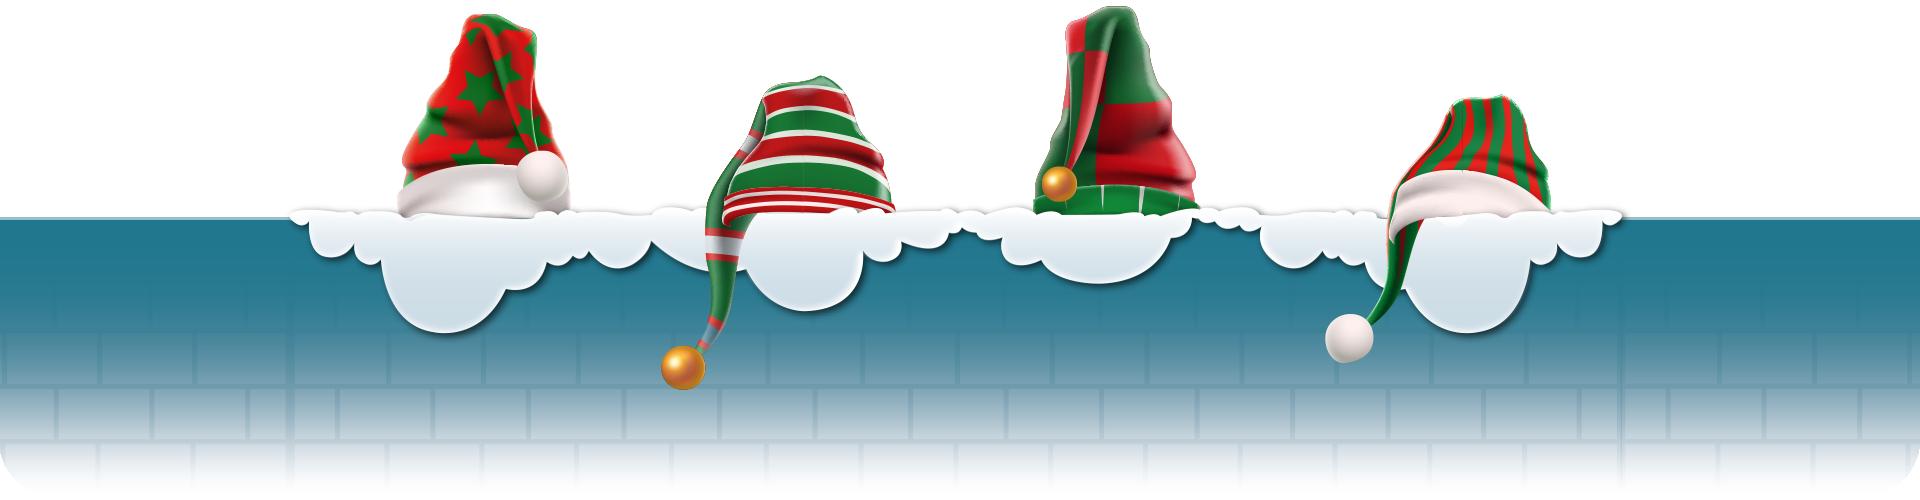 elf hats on snowy wall